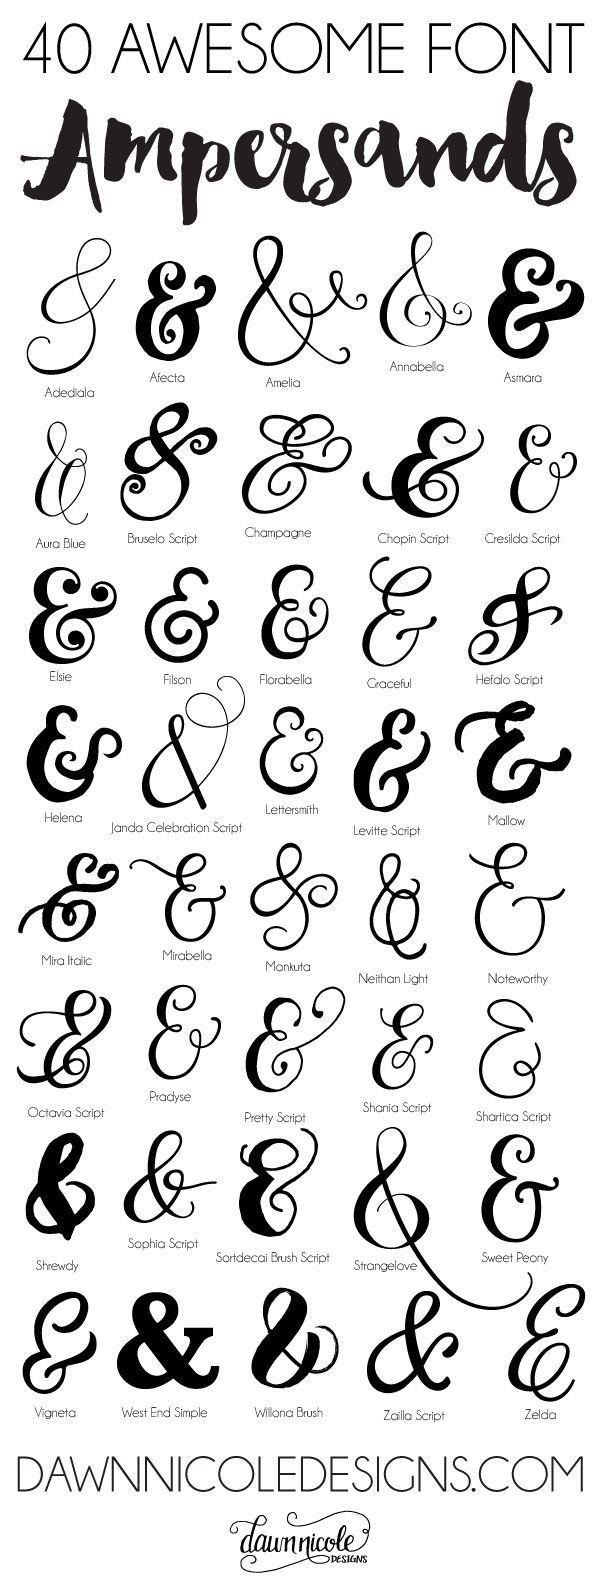 40 Awesome Font Ampersands | dawnnicoledesigns.com